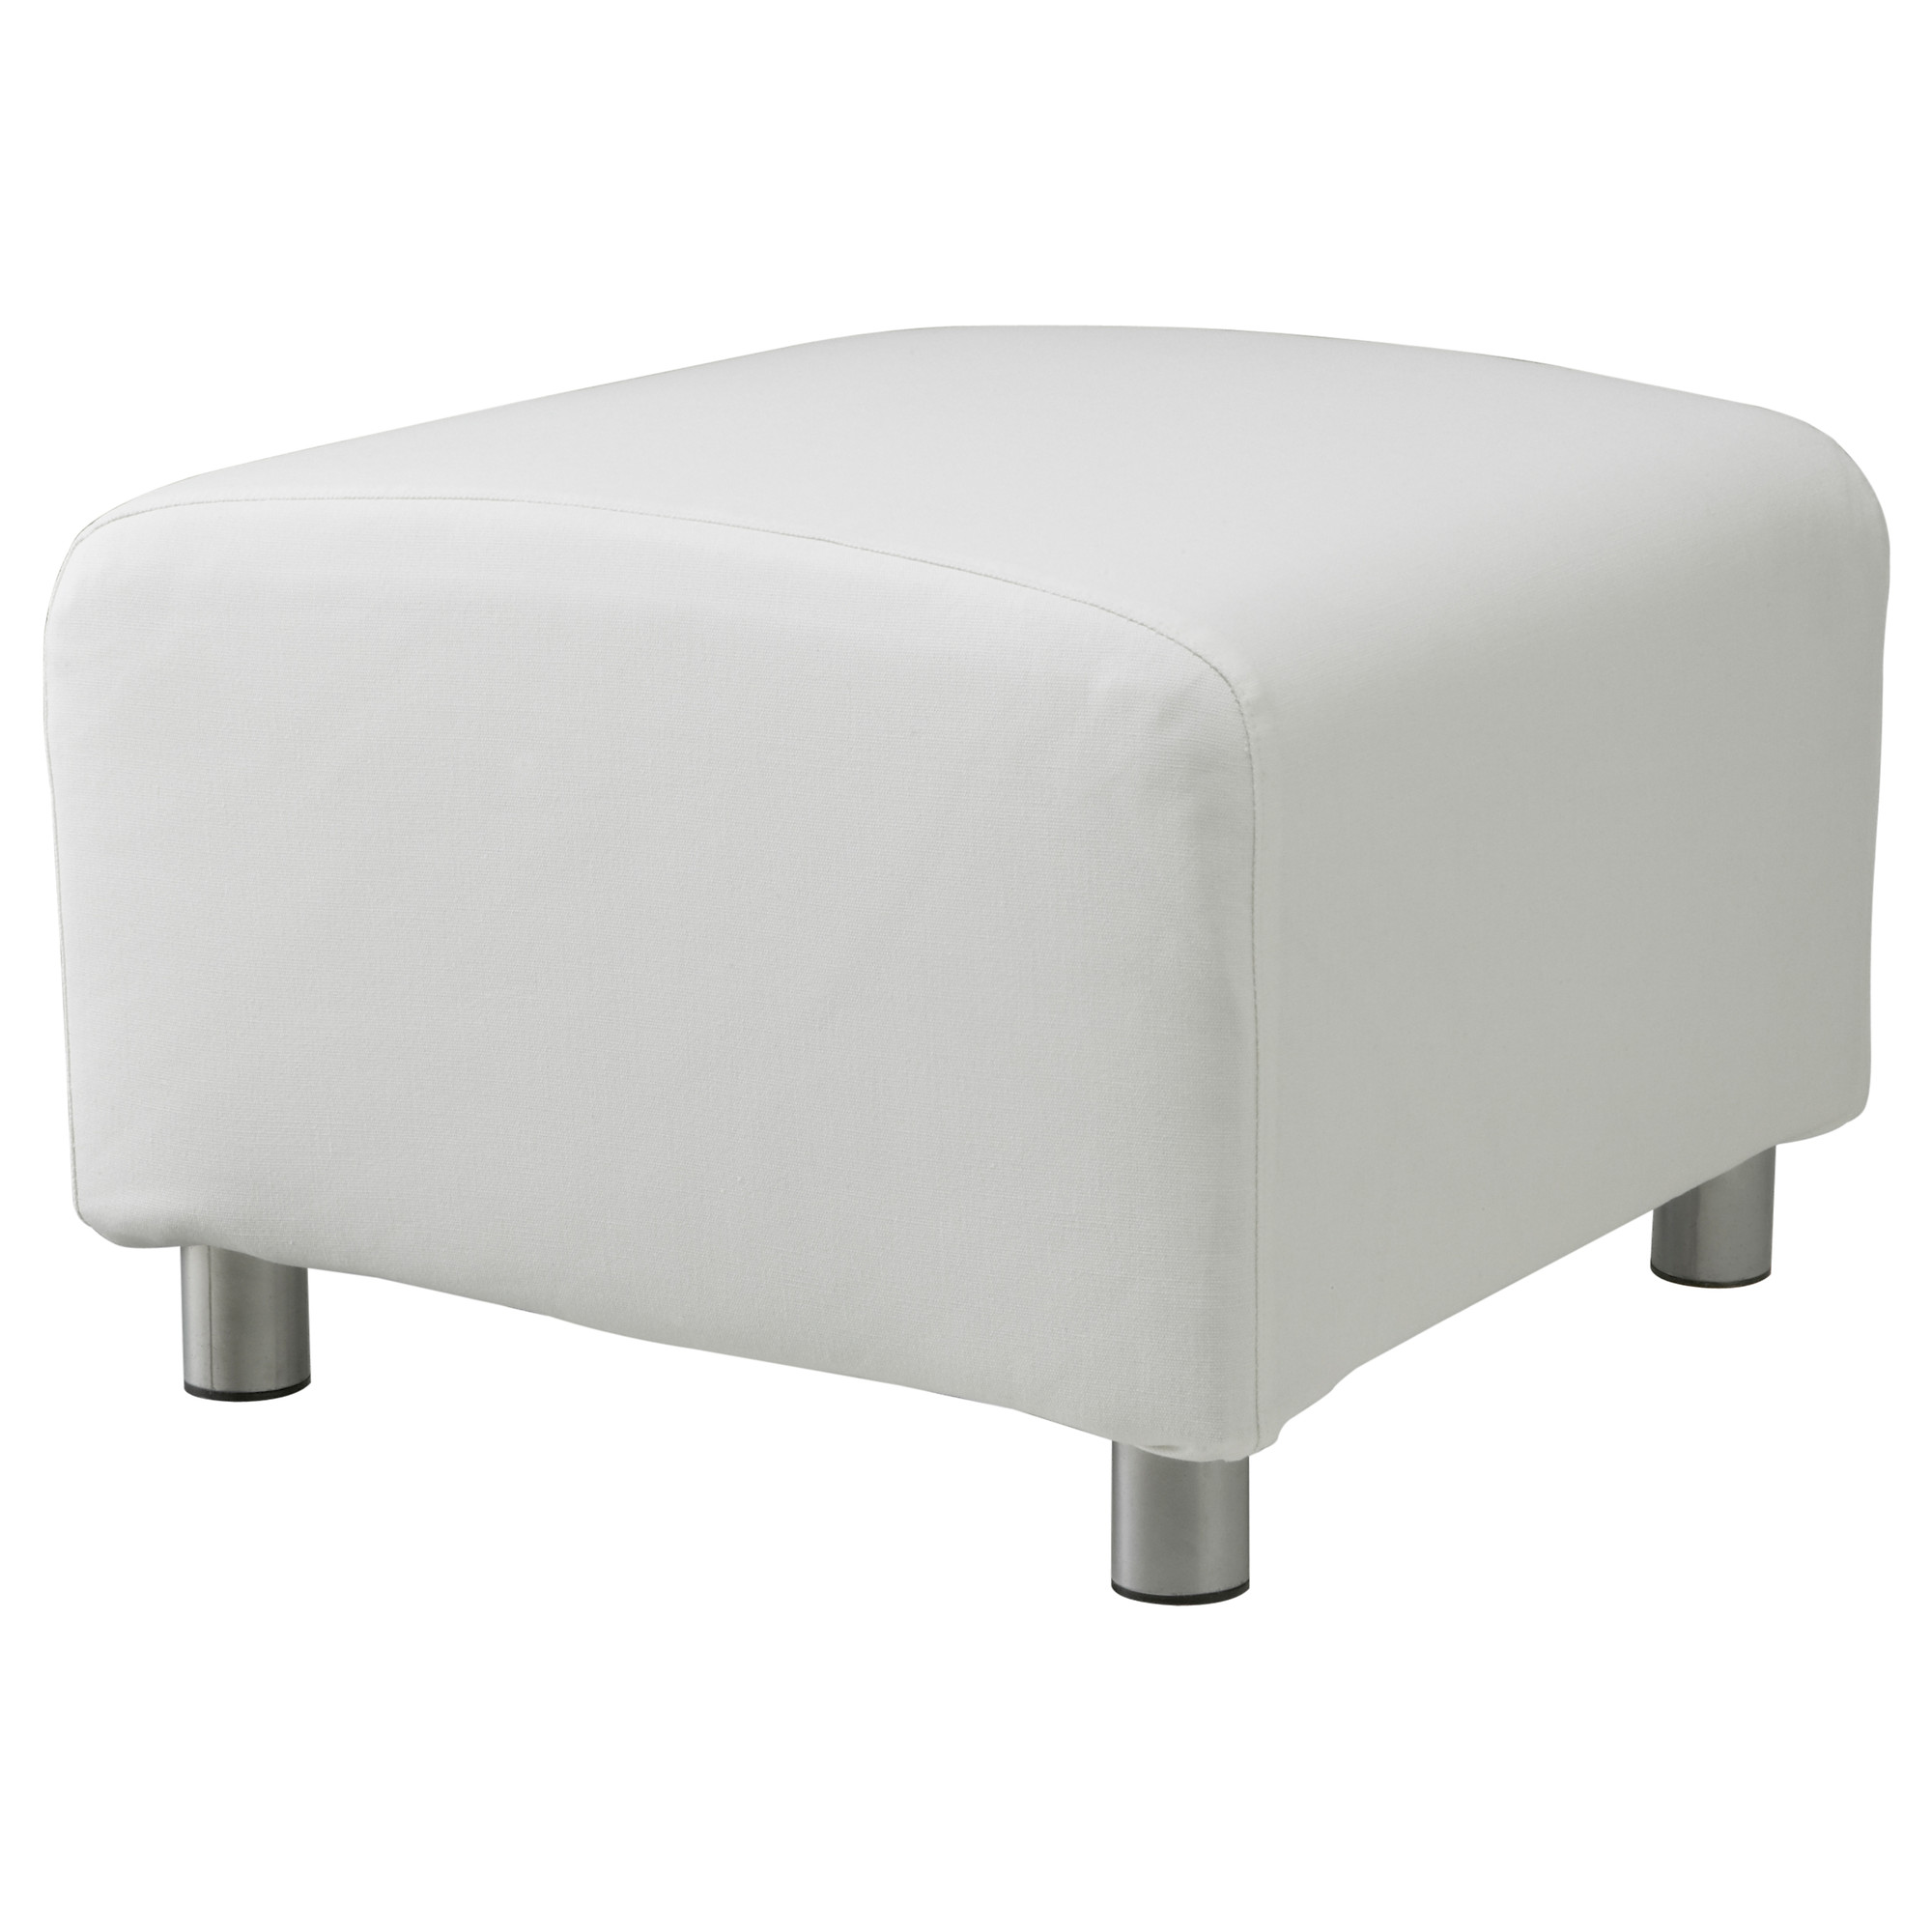 custom slip cover for ikea klippan footstool 100 cotton sofa cover foot stool ebay. Black Bedroom Furniture Sets. Home Design Ideas